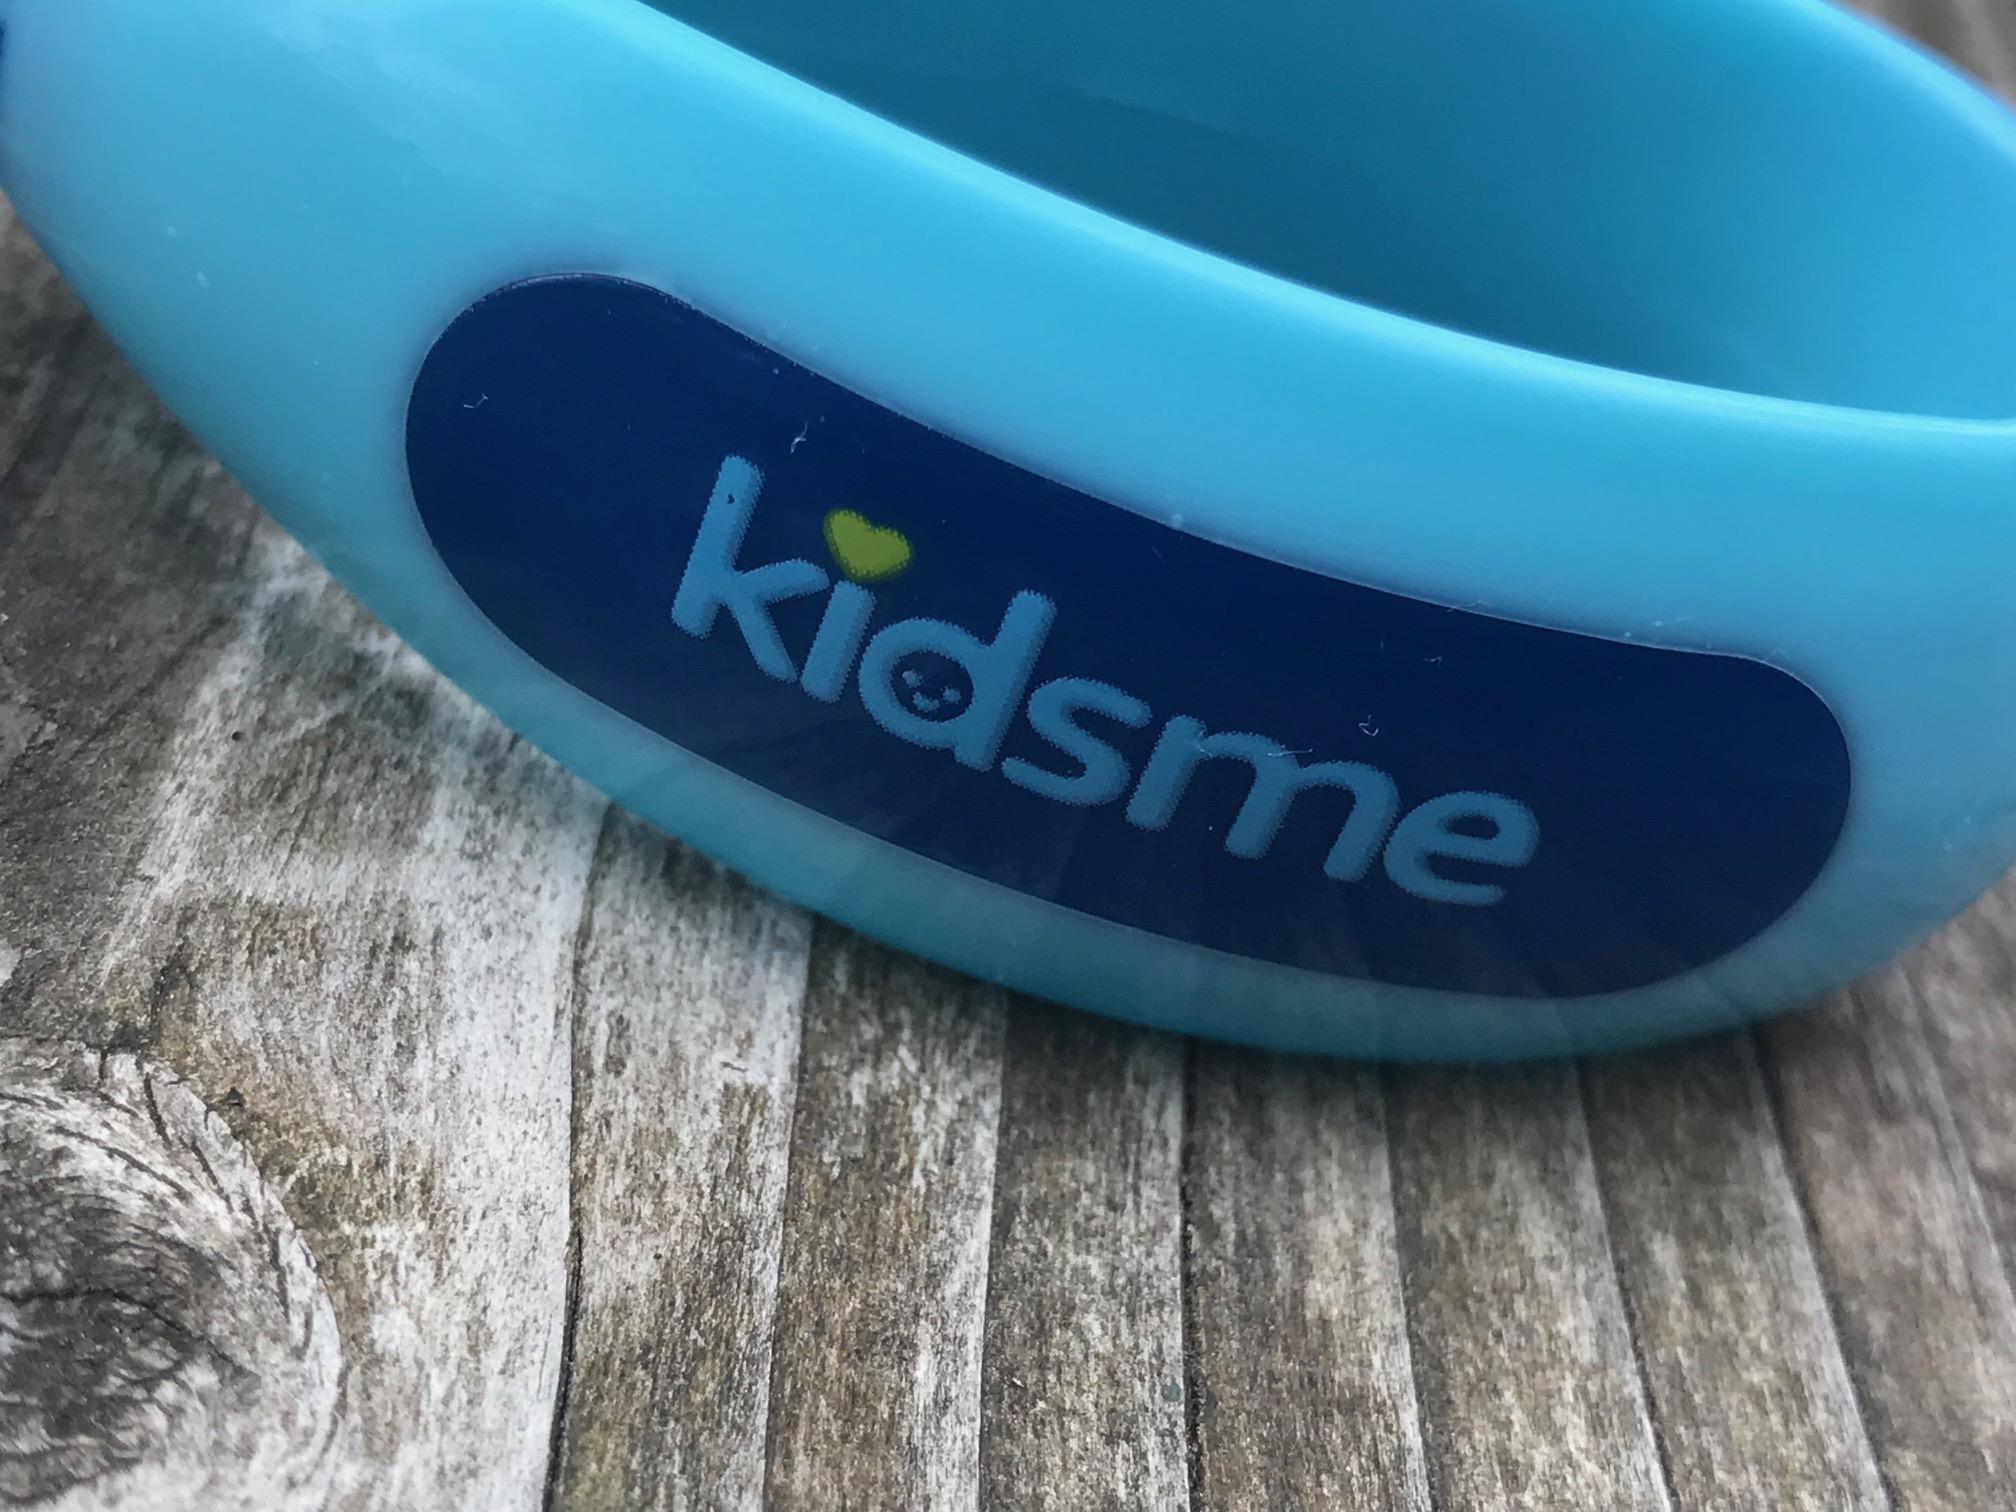 Kidsme My Turn Spoon Trainer Aqua, Blue. Non-detect for Lead, Cadmium, Mercury, Antimony and Arsenic.